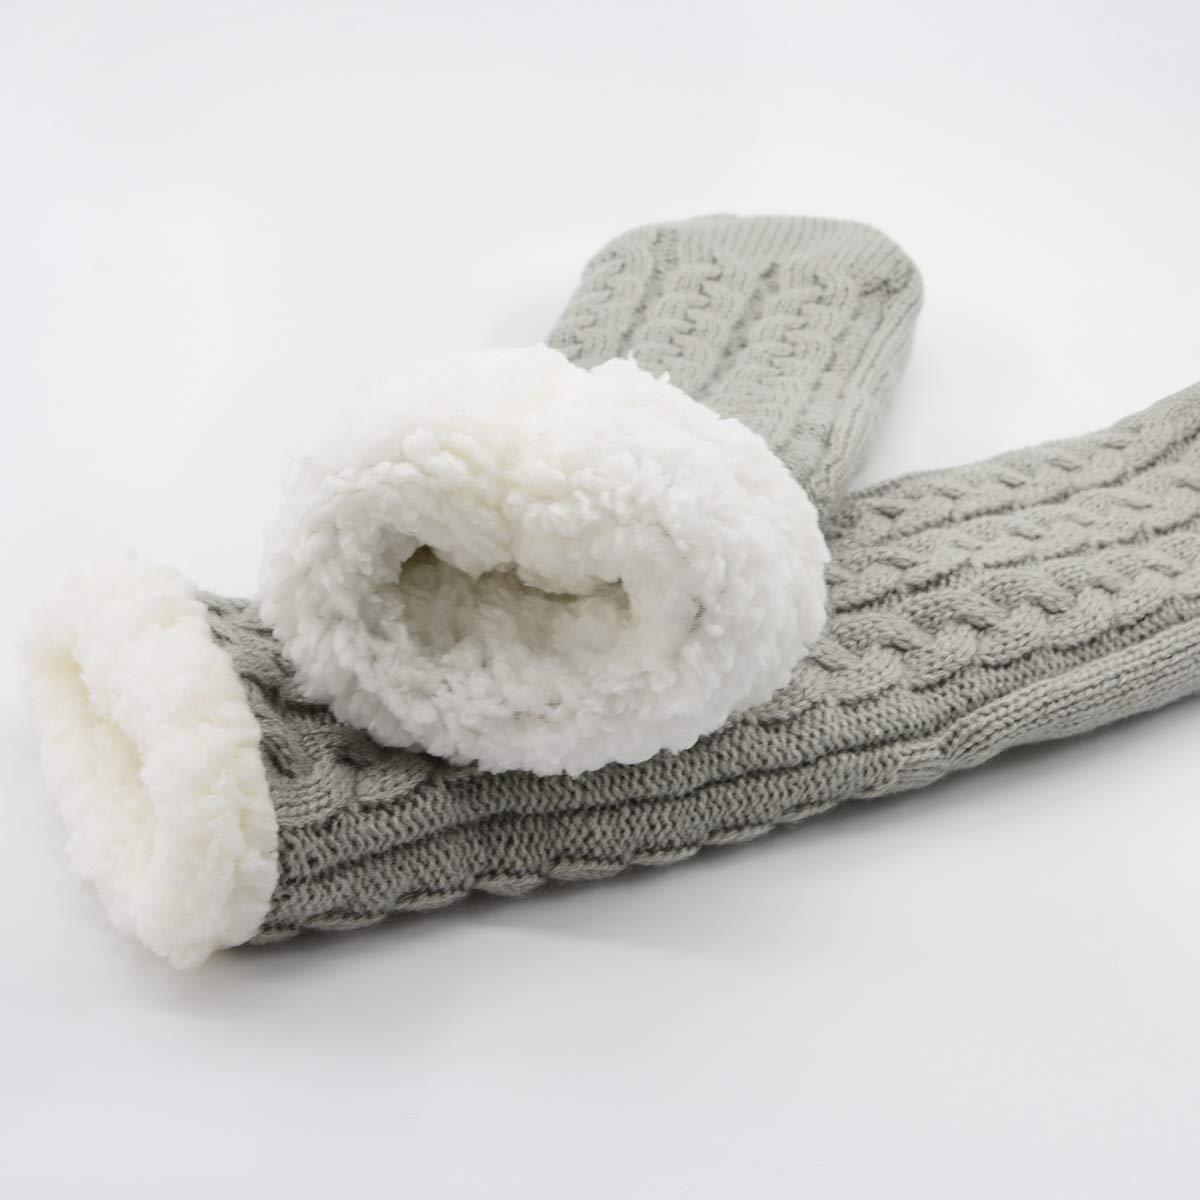 Century Star Womens Fuzzy Slipper Socks Warm Knit Thick Soft Heavy Fleece lined Christmas Gift Stockings Winter Socks